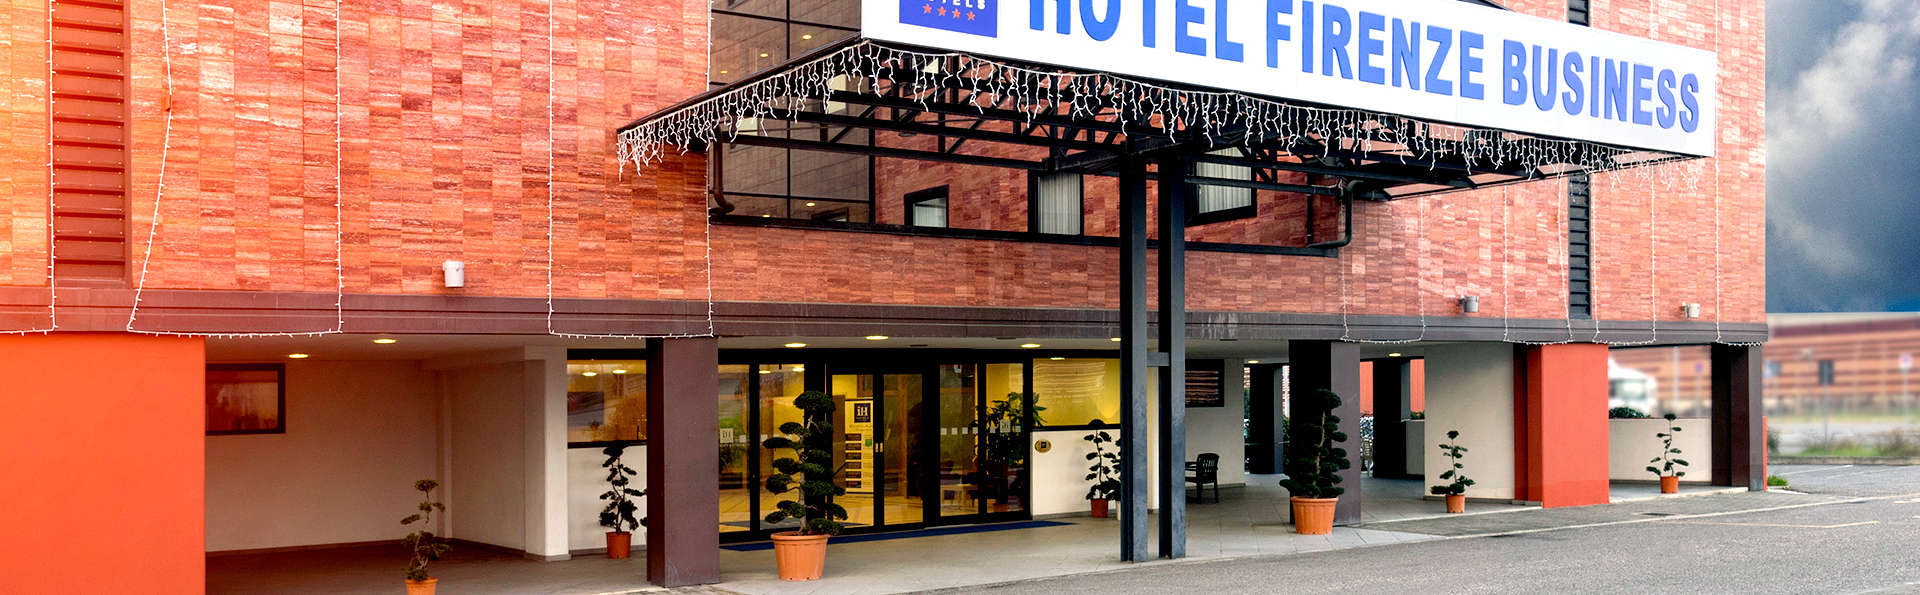 IH Hotels Firenze Business - Edit_Front.jpg